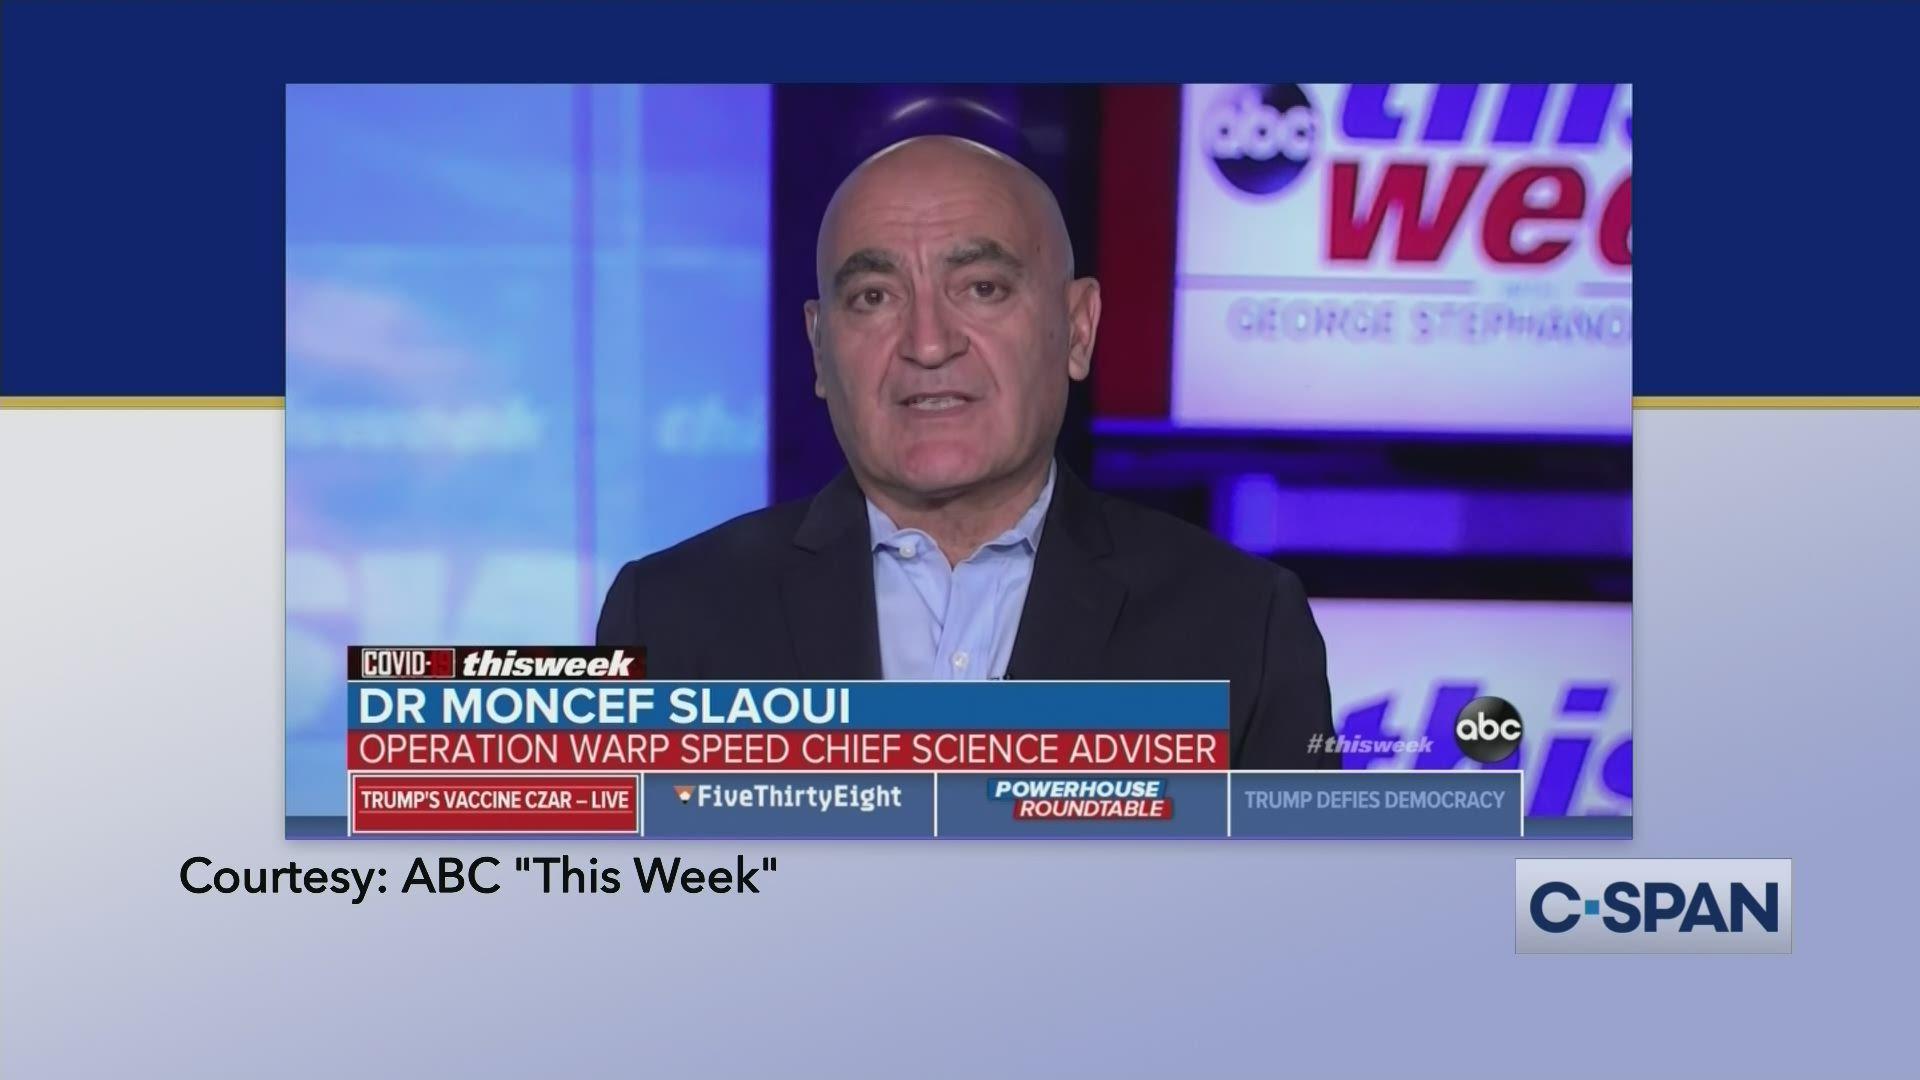 Dr Moncef Slaoui On Covid 19 Vaccine C Span Org